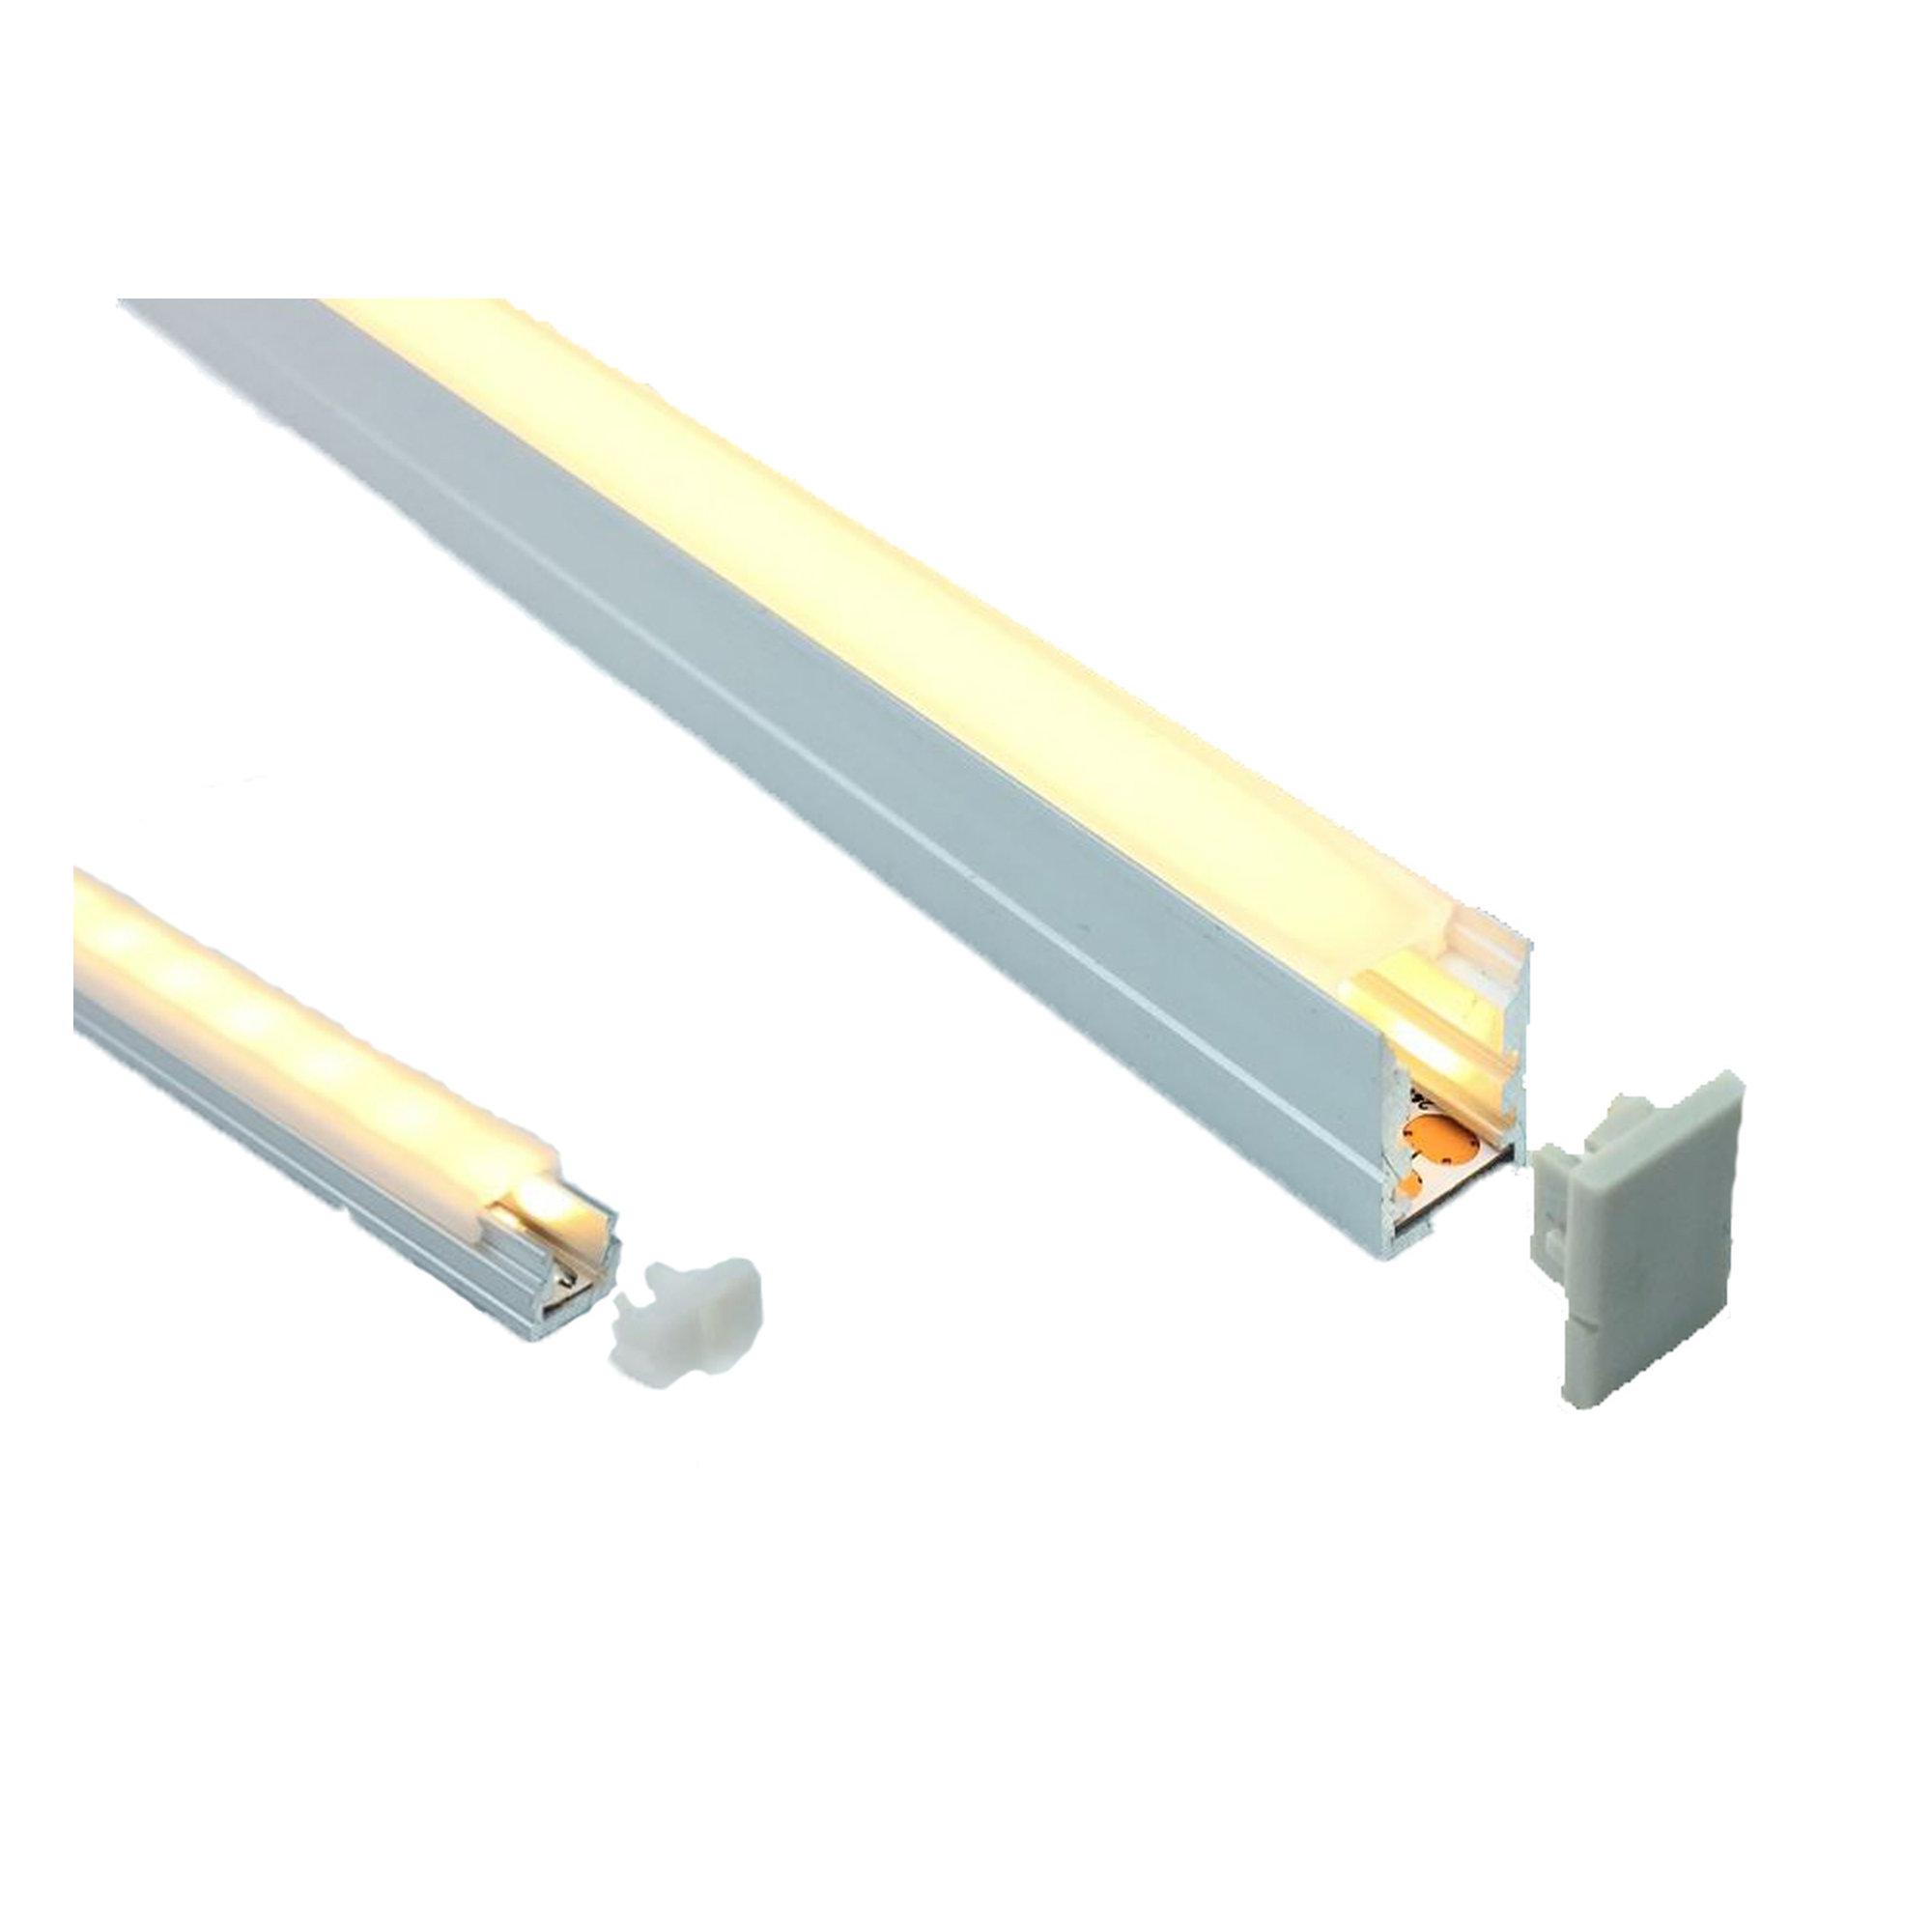 LED profile 17 x 7mm Opal Diffuser Trim